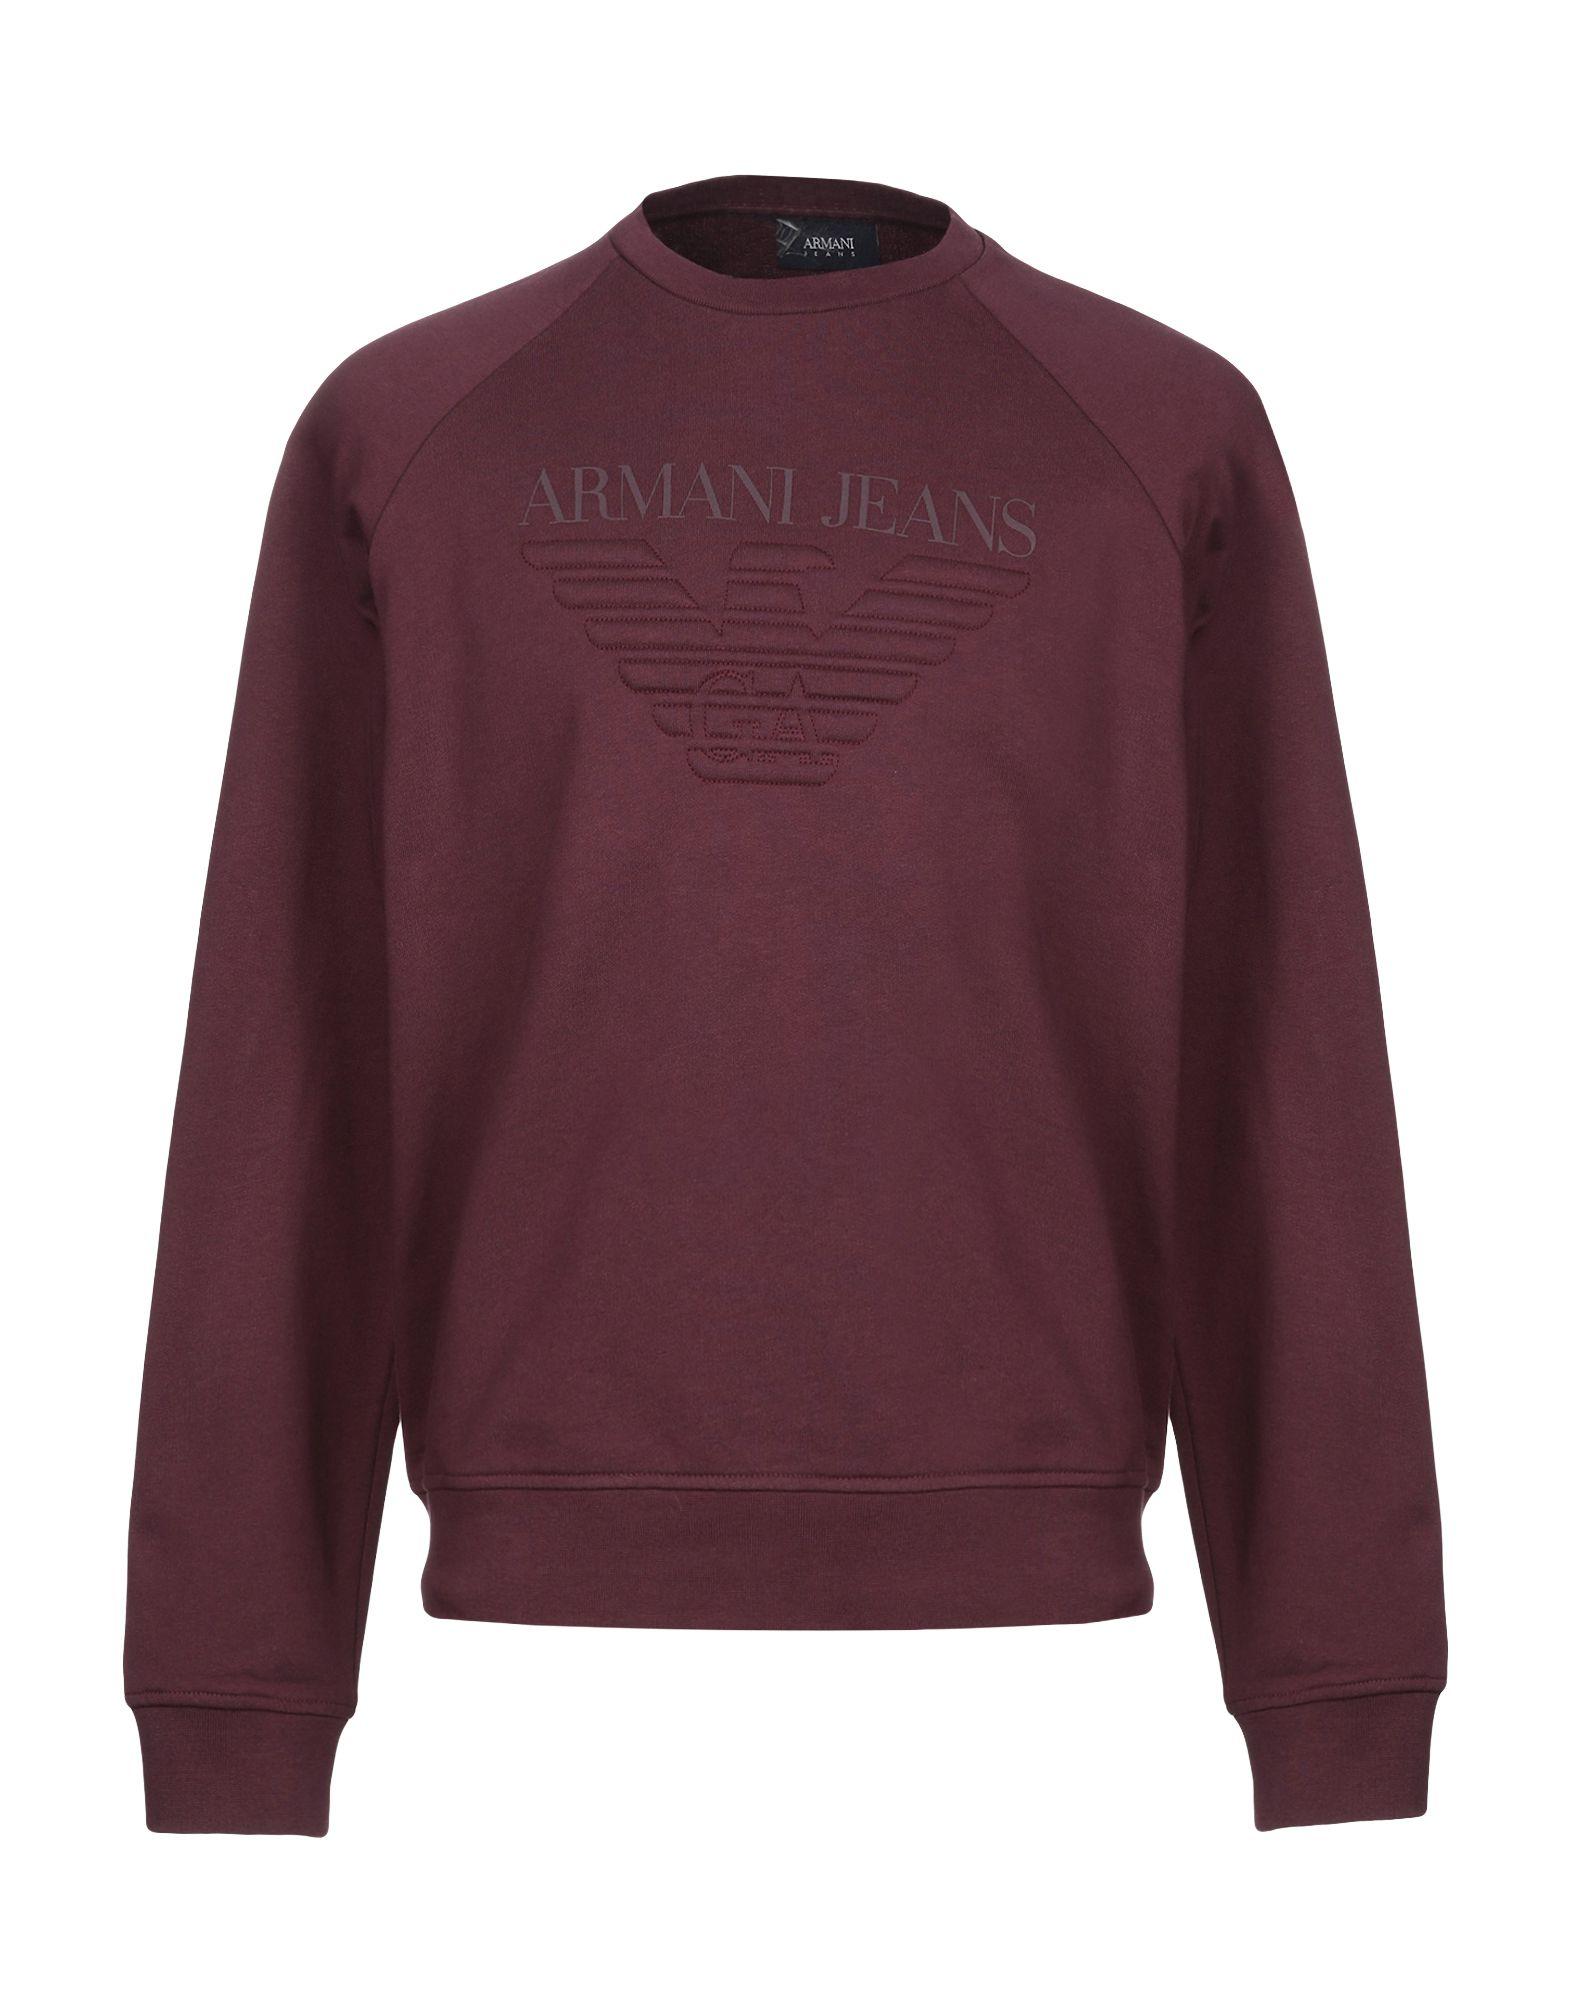 043e988de16 Download (650x890) · ARMANI JEANS Knitwear for Men ModeSens Download  (1571x2000) · Emporio ...